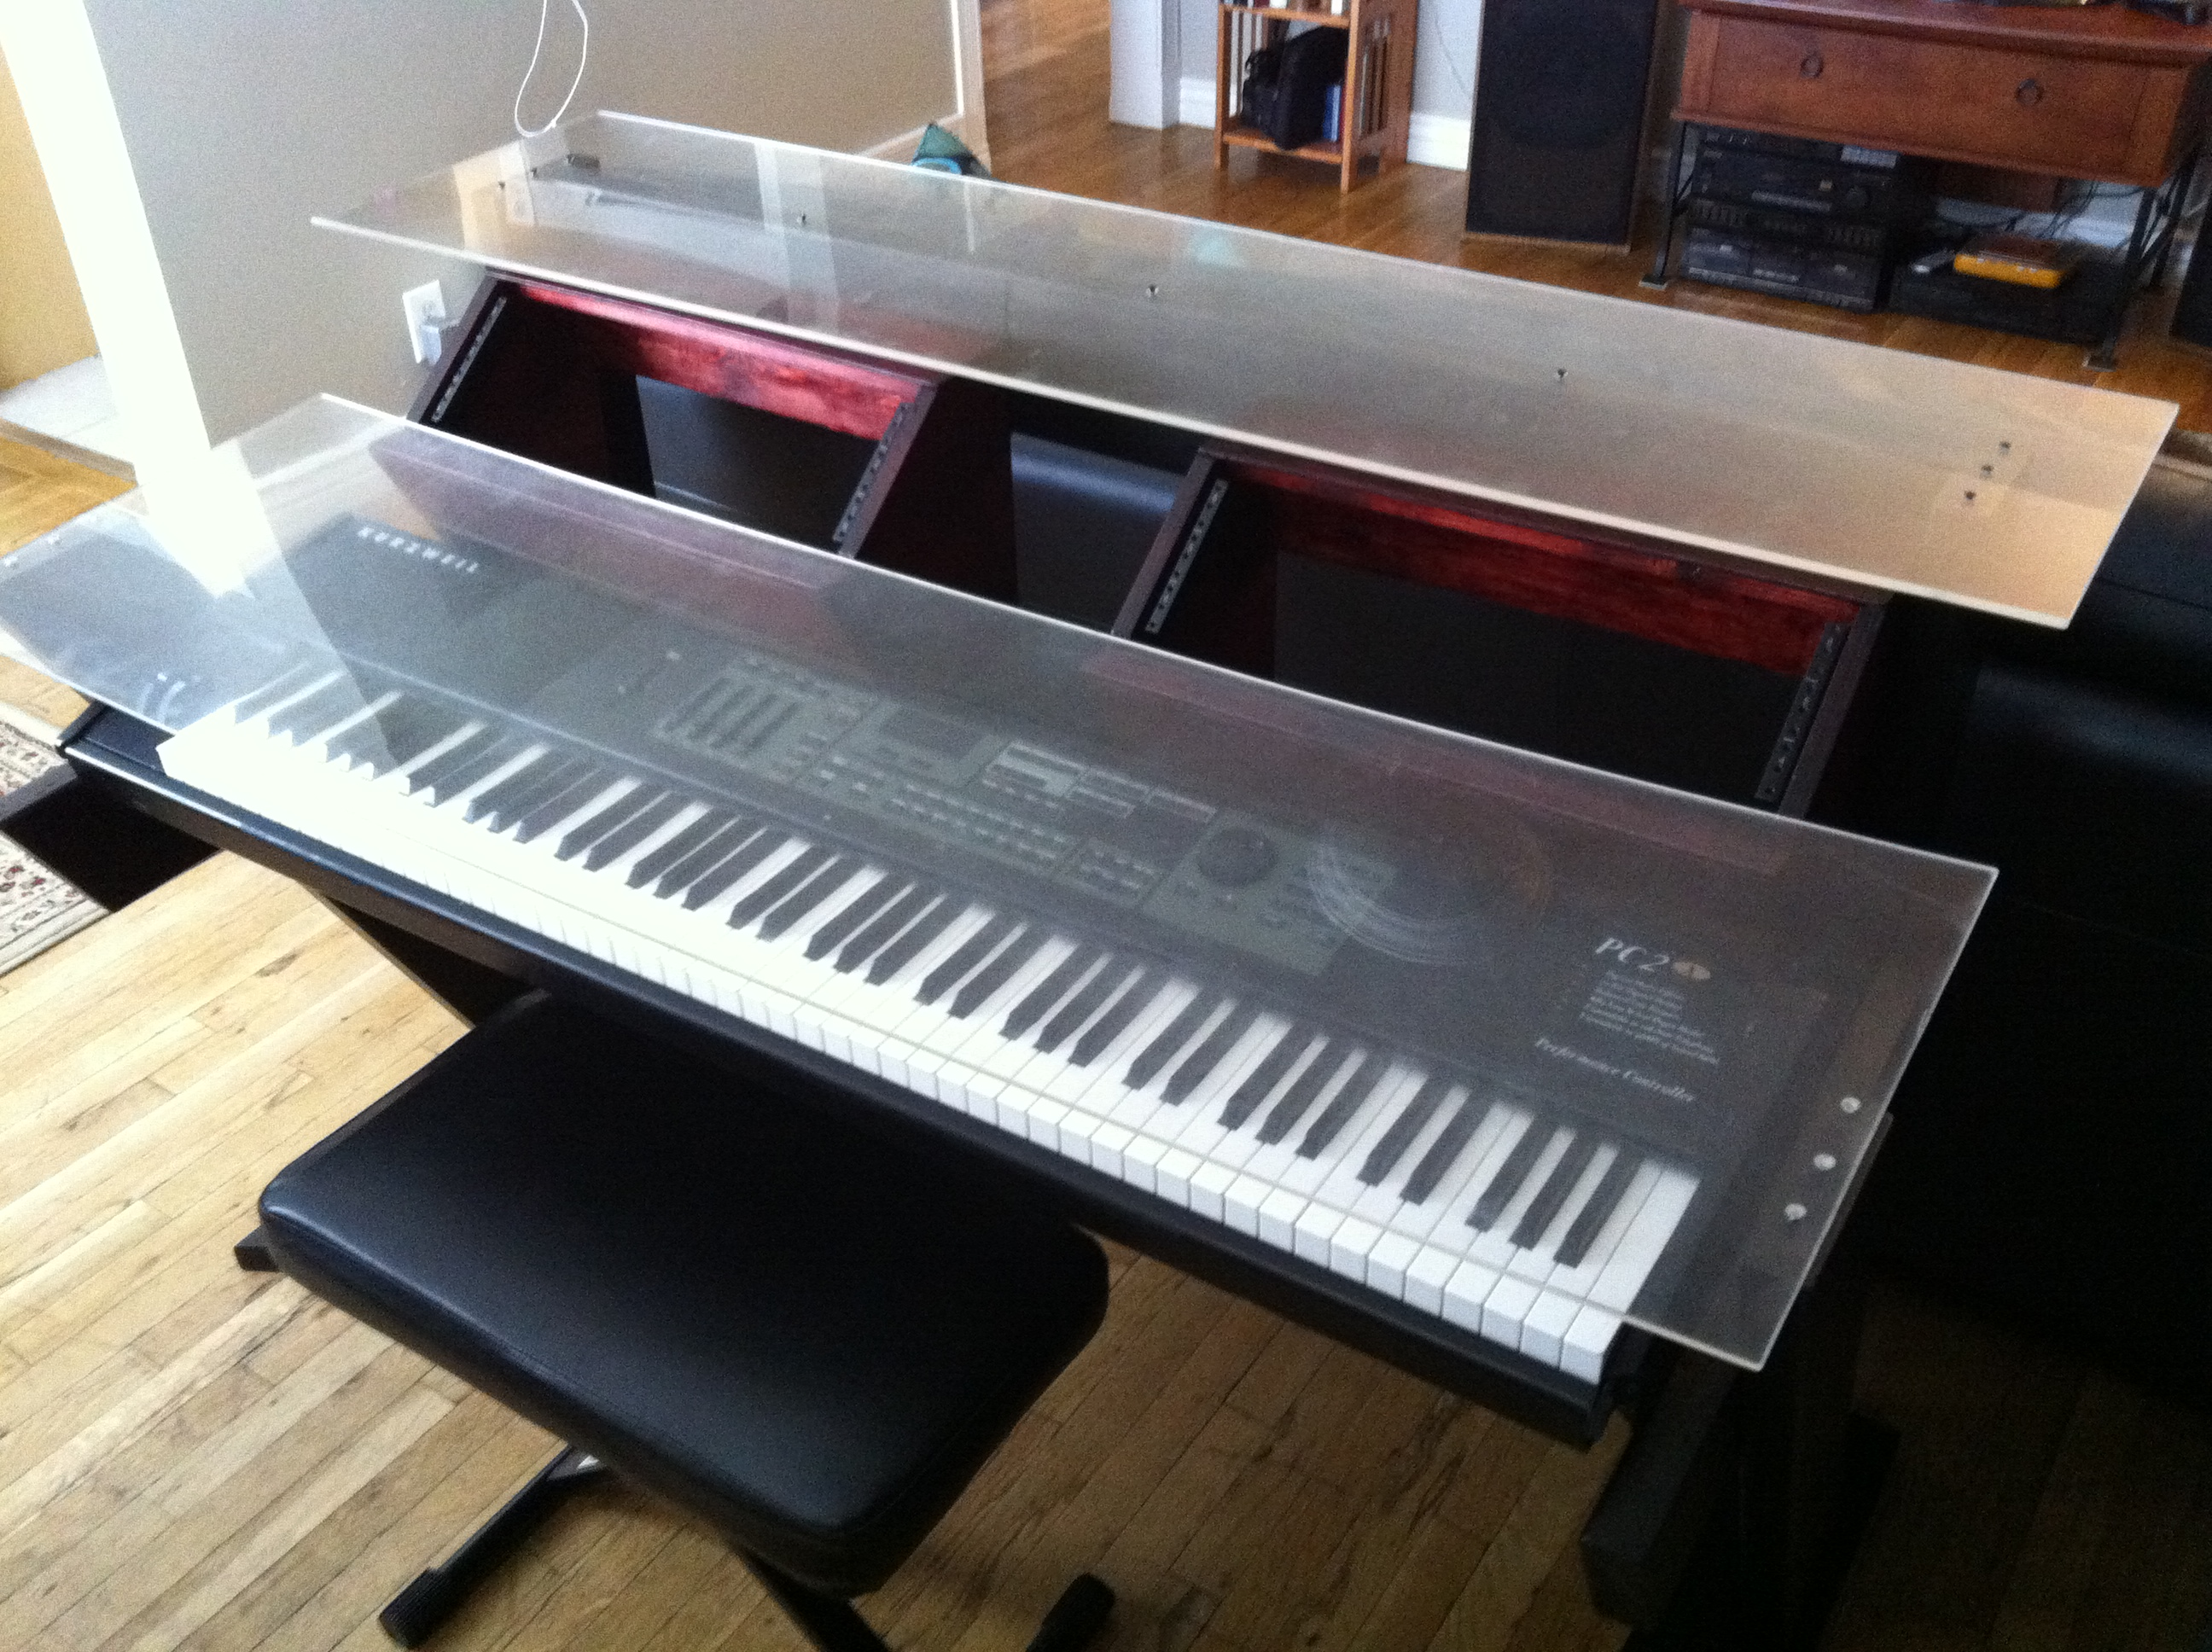 Diy Studio Desk Keyboard Workstation Under 0 Img 1726 Jpg